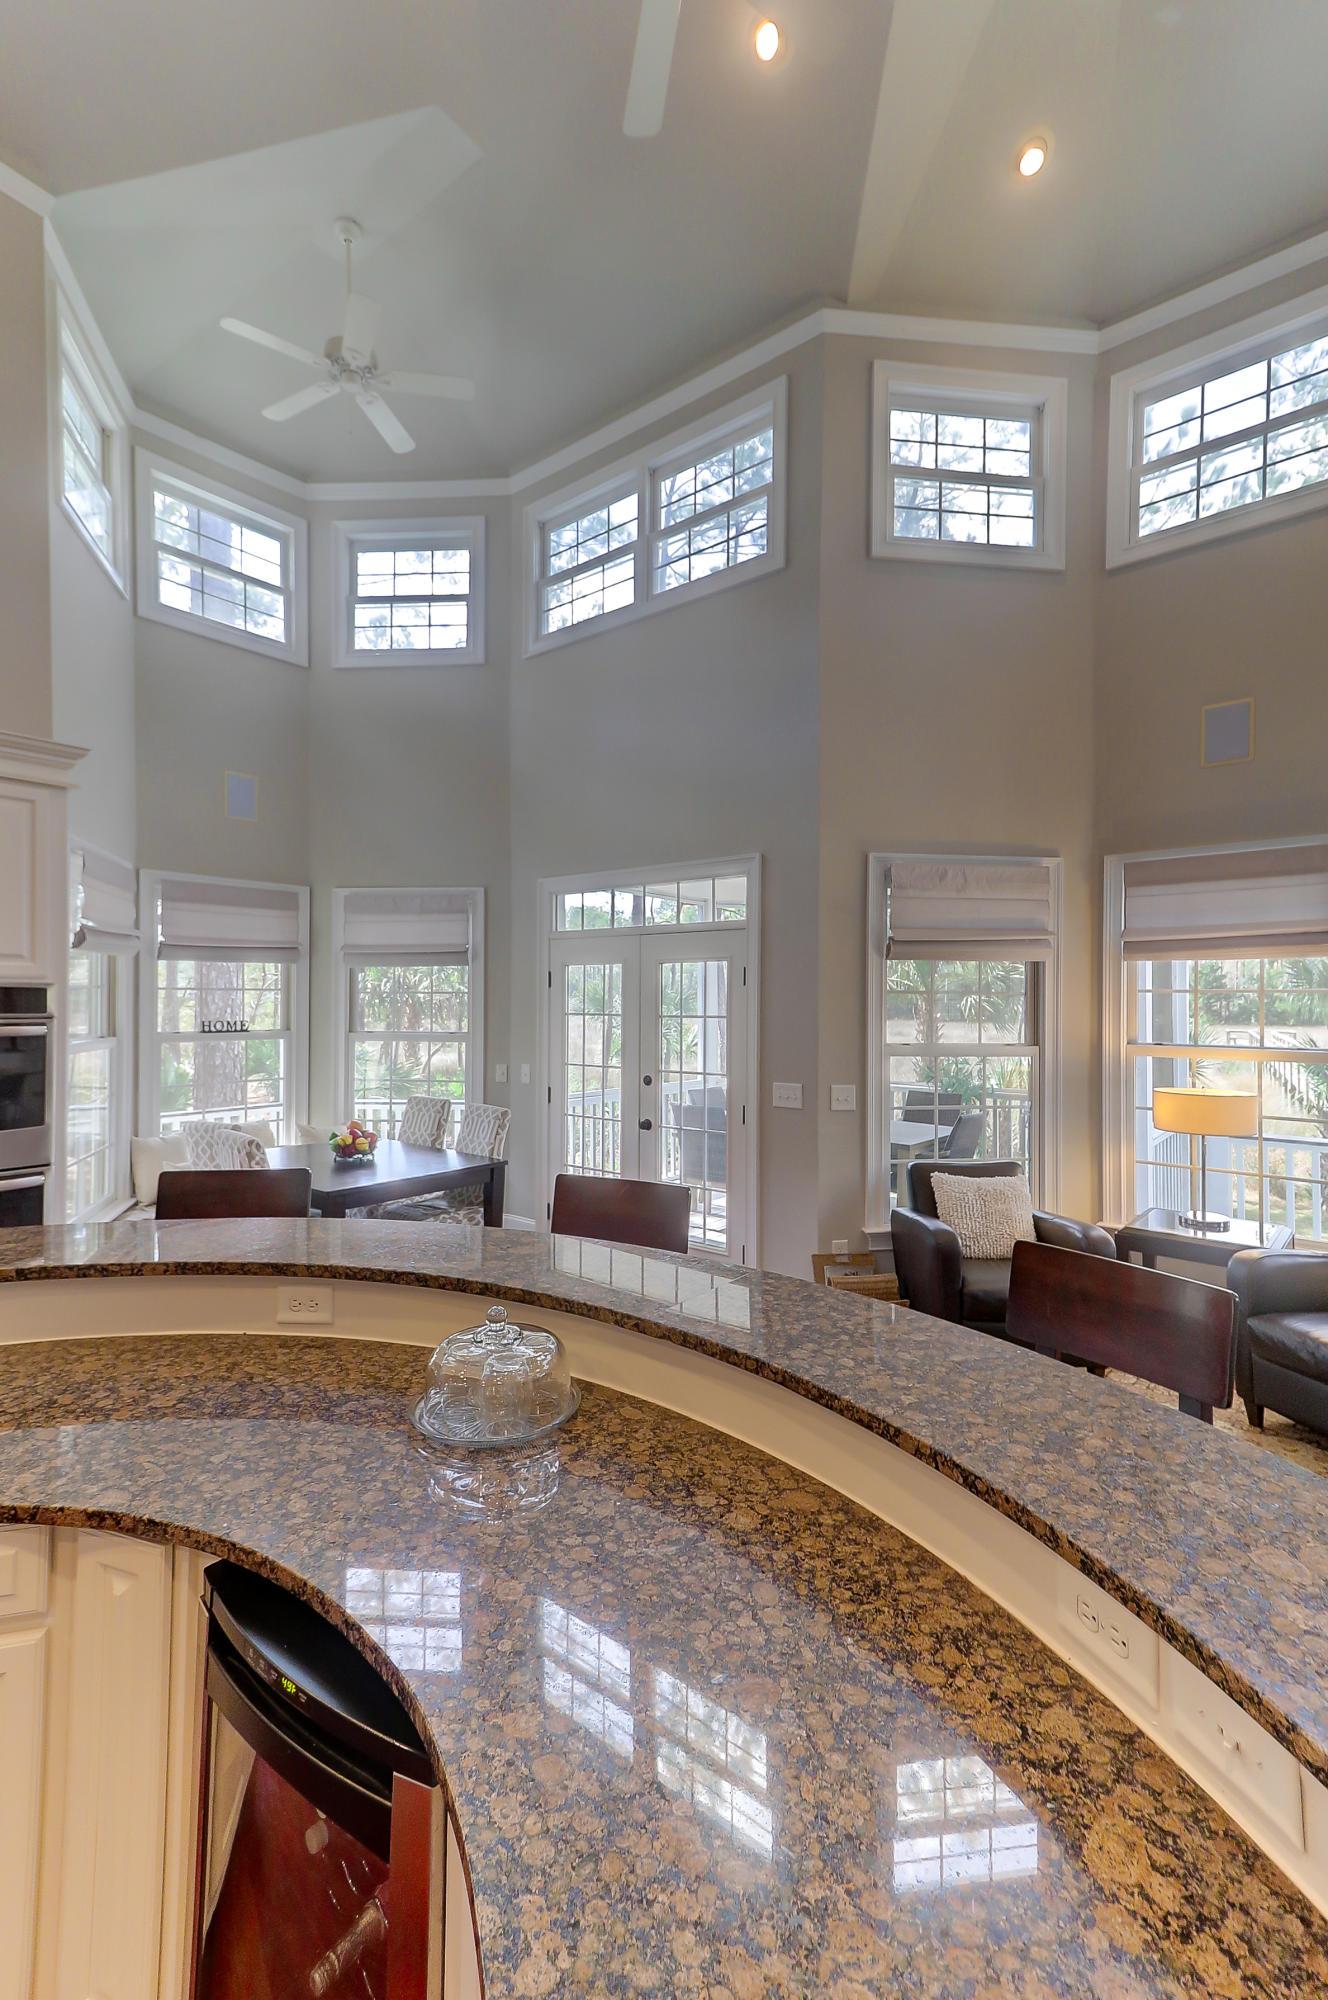 Dunes West Homes For Sale - 2996 Pignatelli Crescent, Mount Pleasant, SC - 17